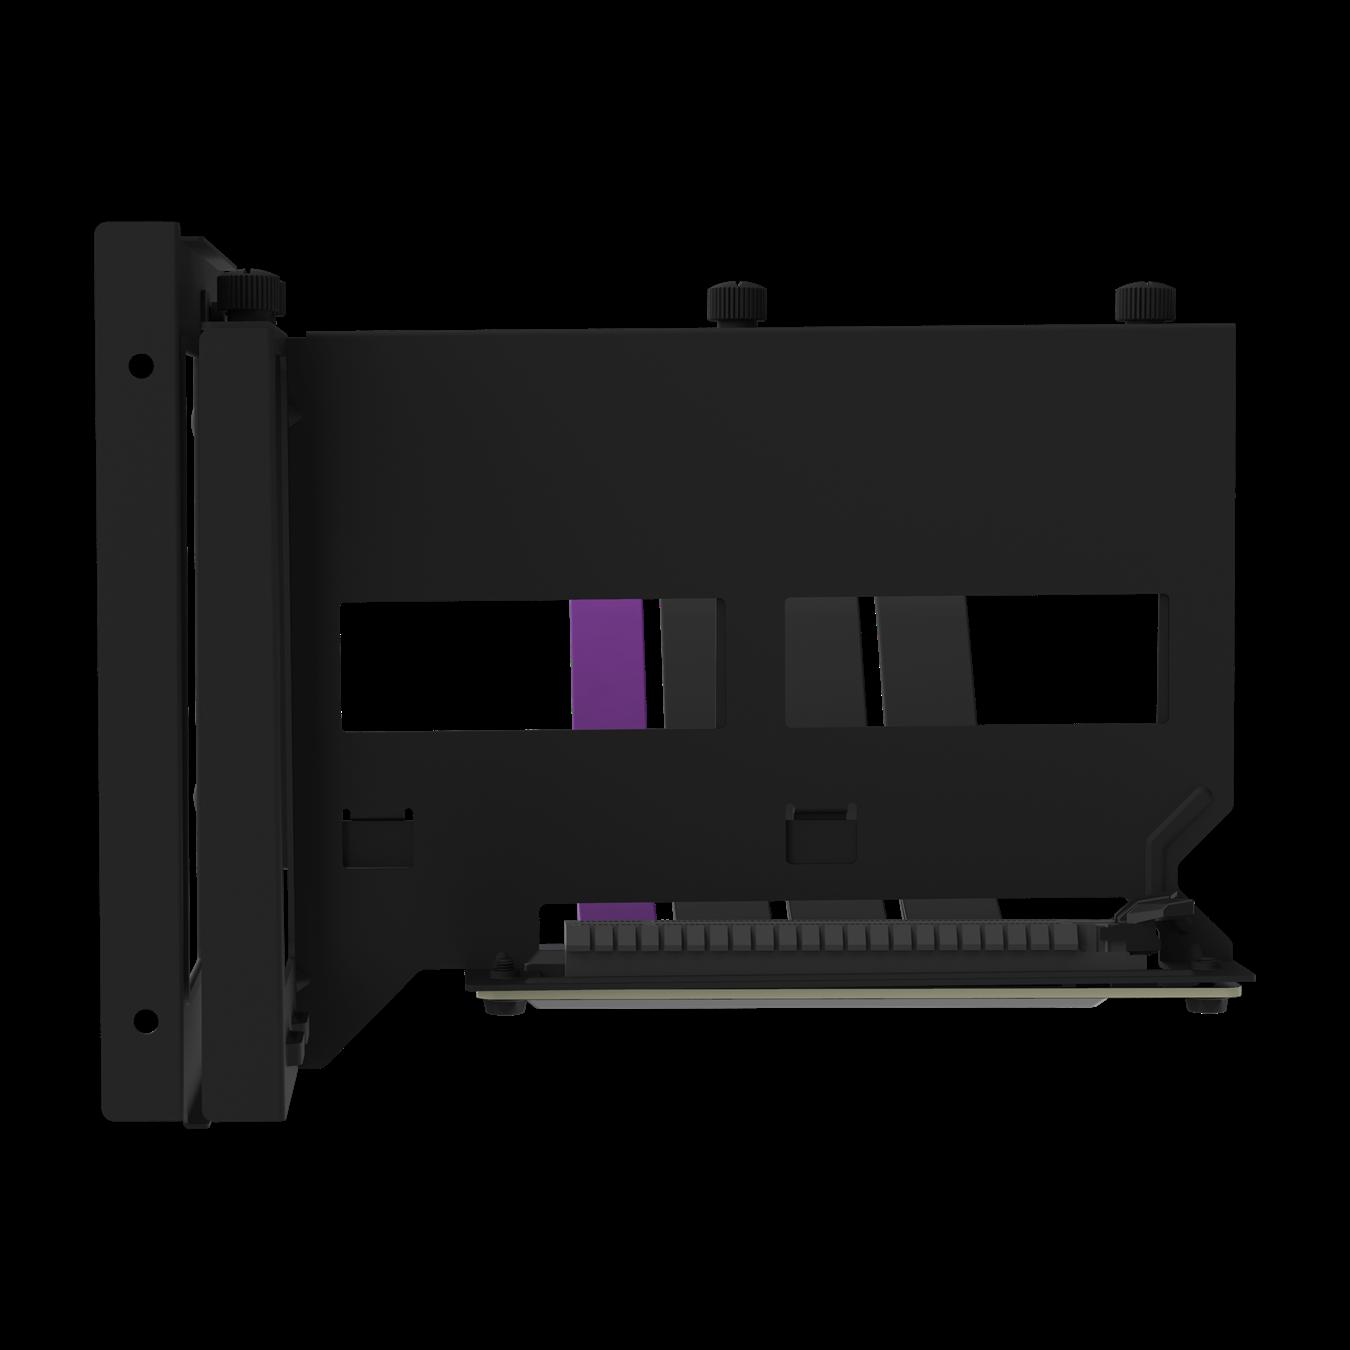 Front view of the black Universal Vertical GPU Bracket.